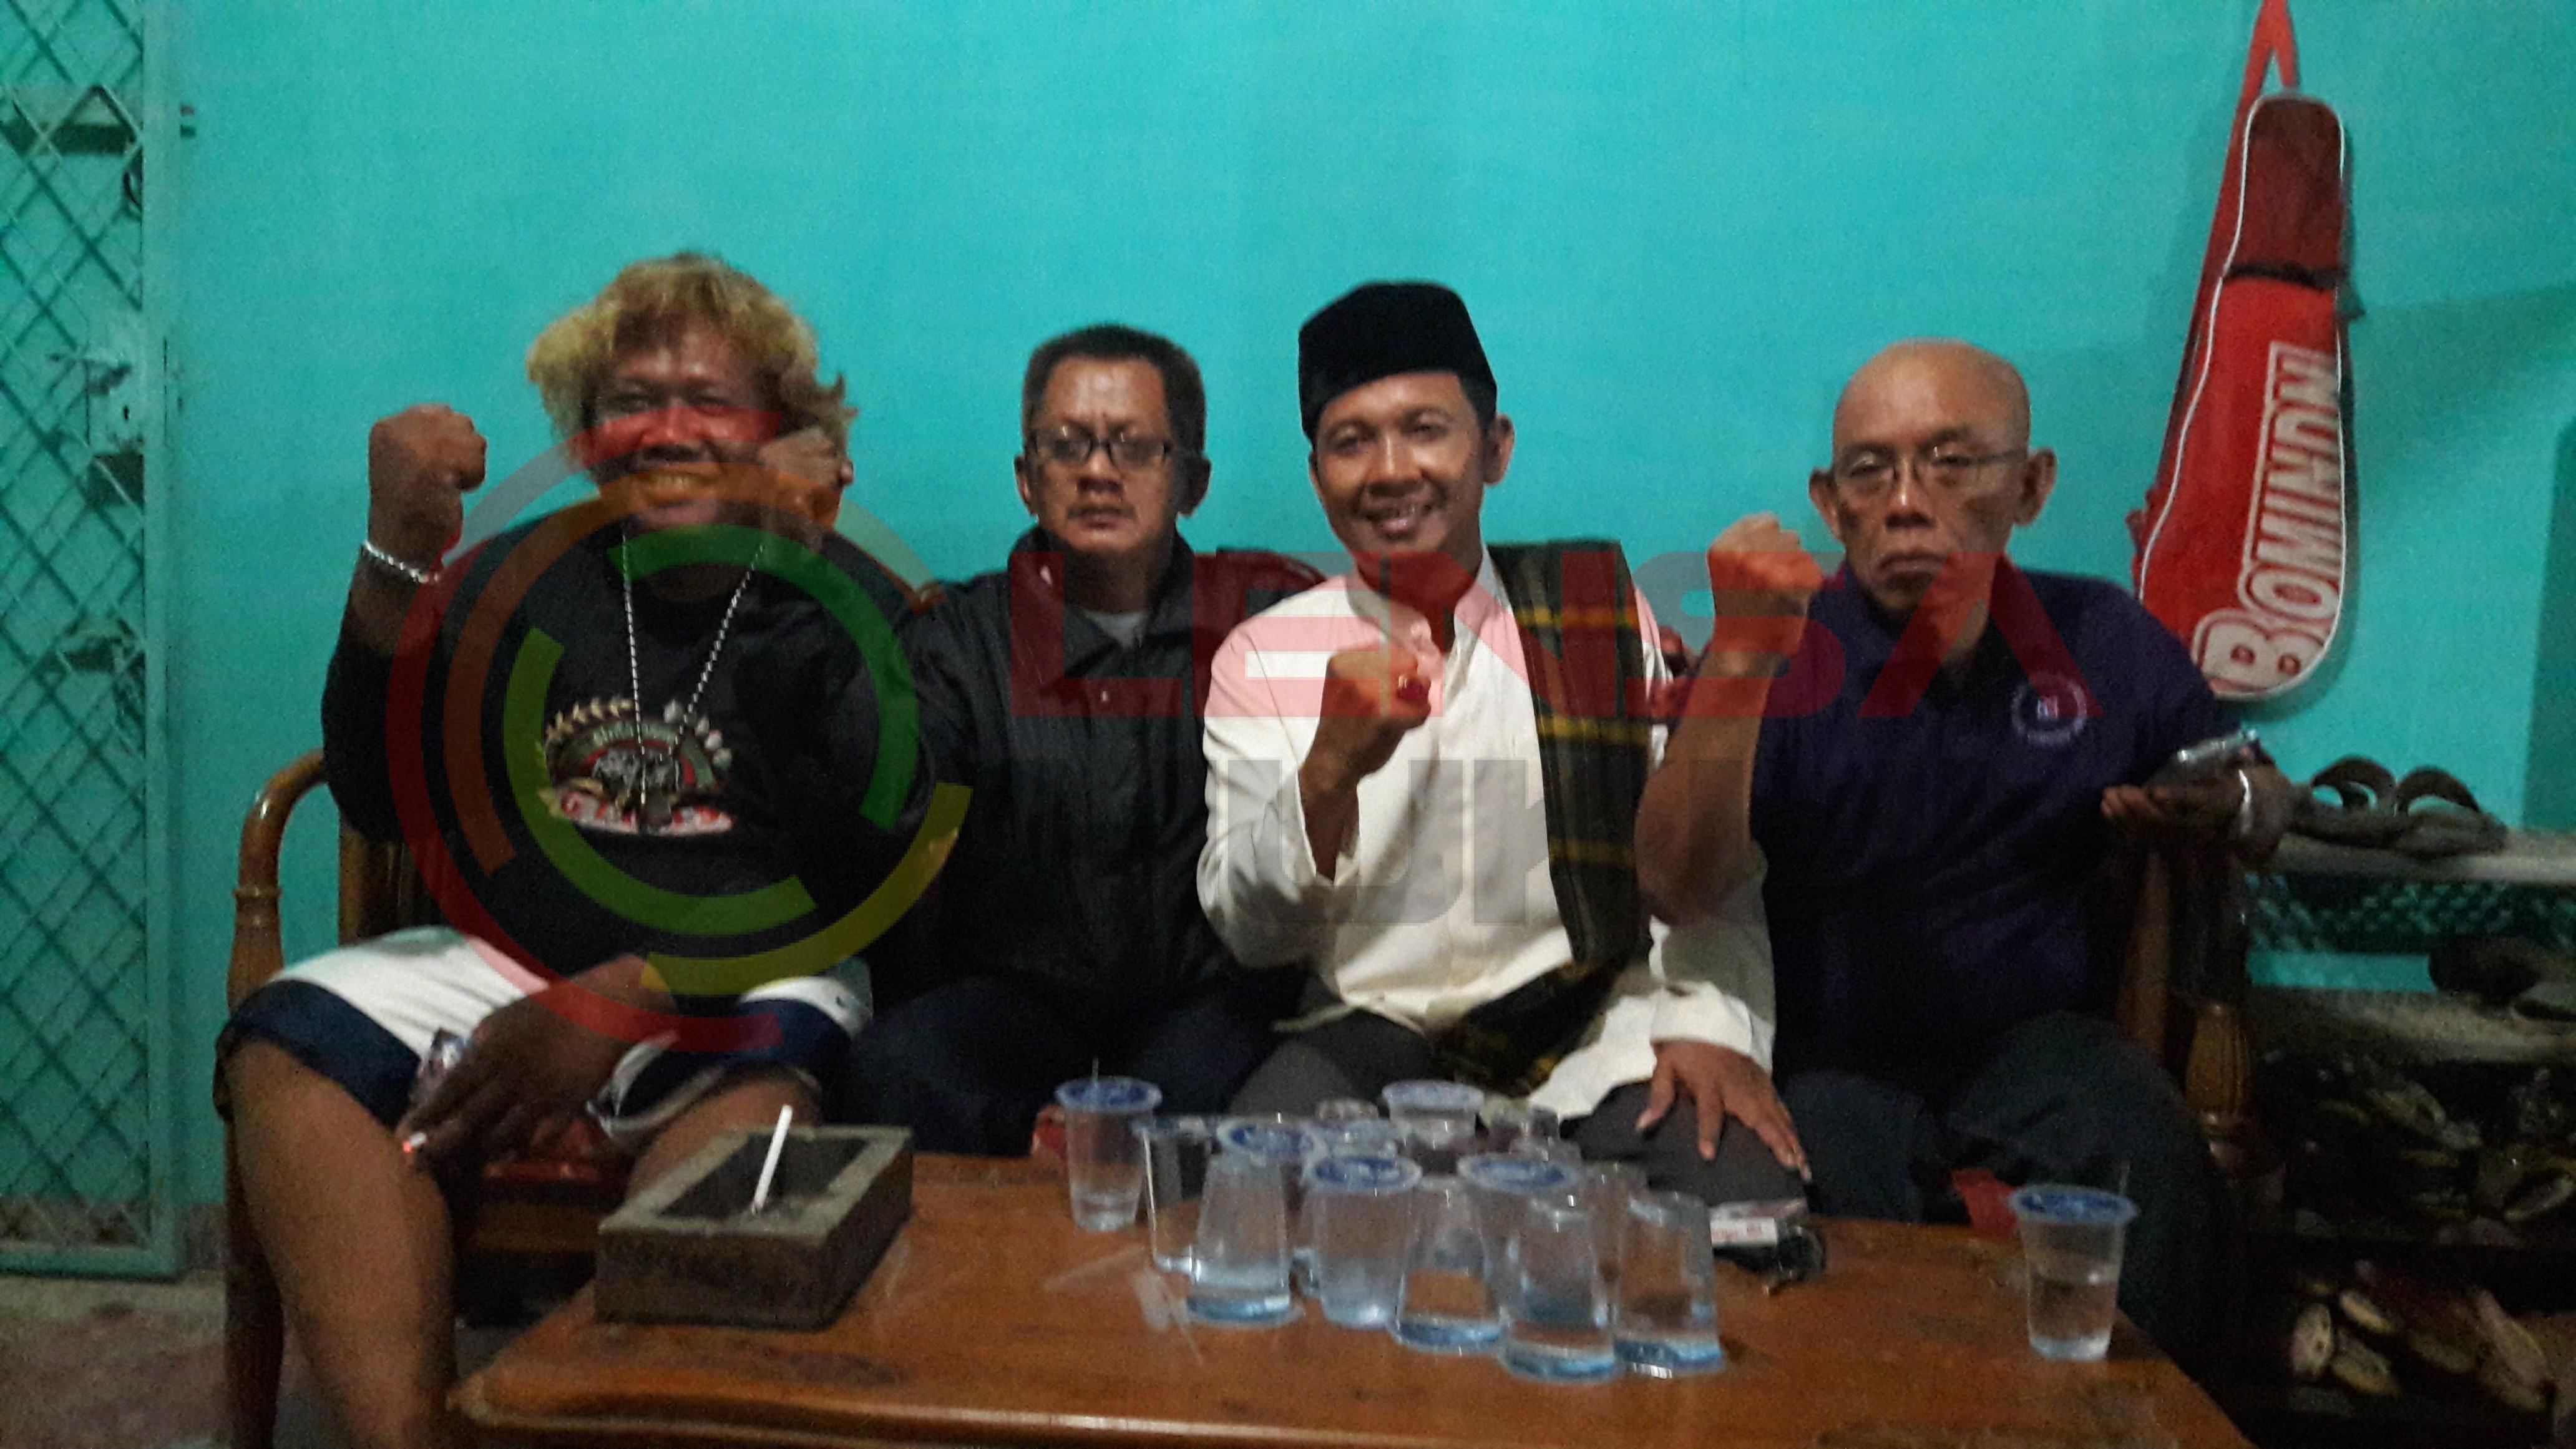 LensaHukum.co.id - Asta Razan Akhirnya Terpilih Kades Satria Jaya 3 - Asta Razan Akhirnya Terpilih Kades Satria Jaya